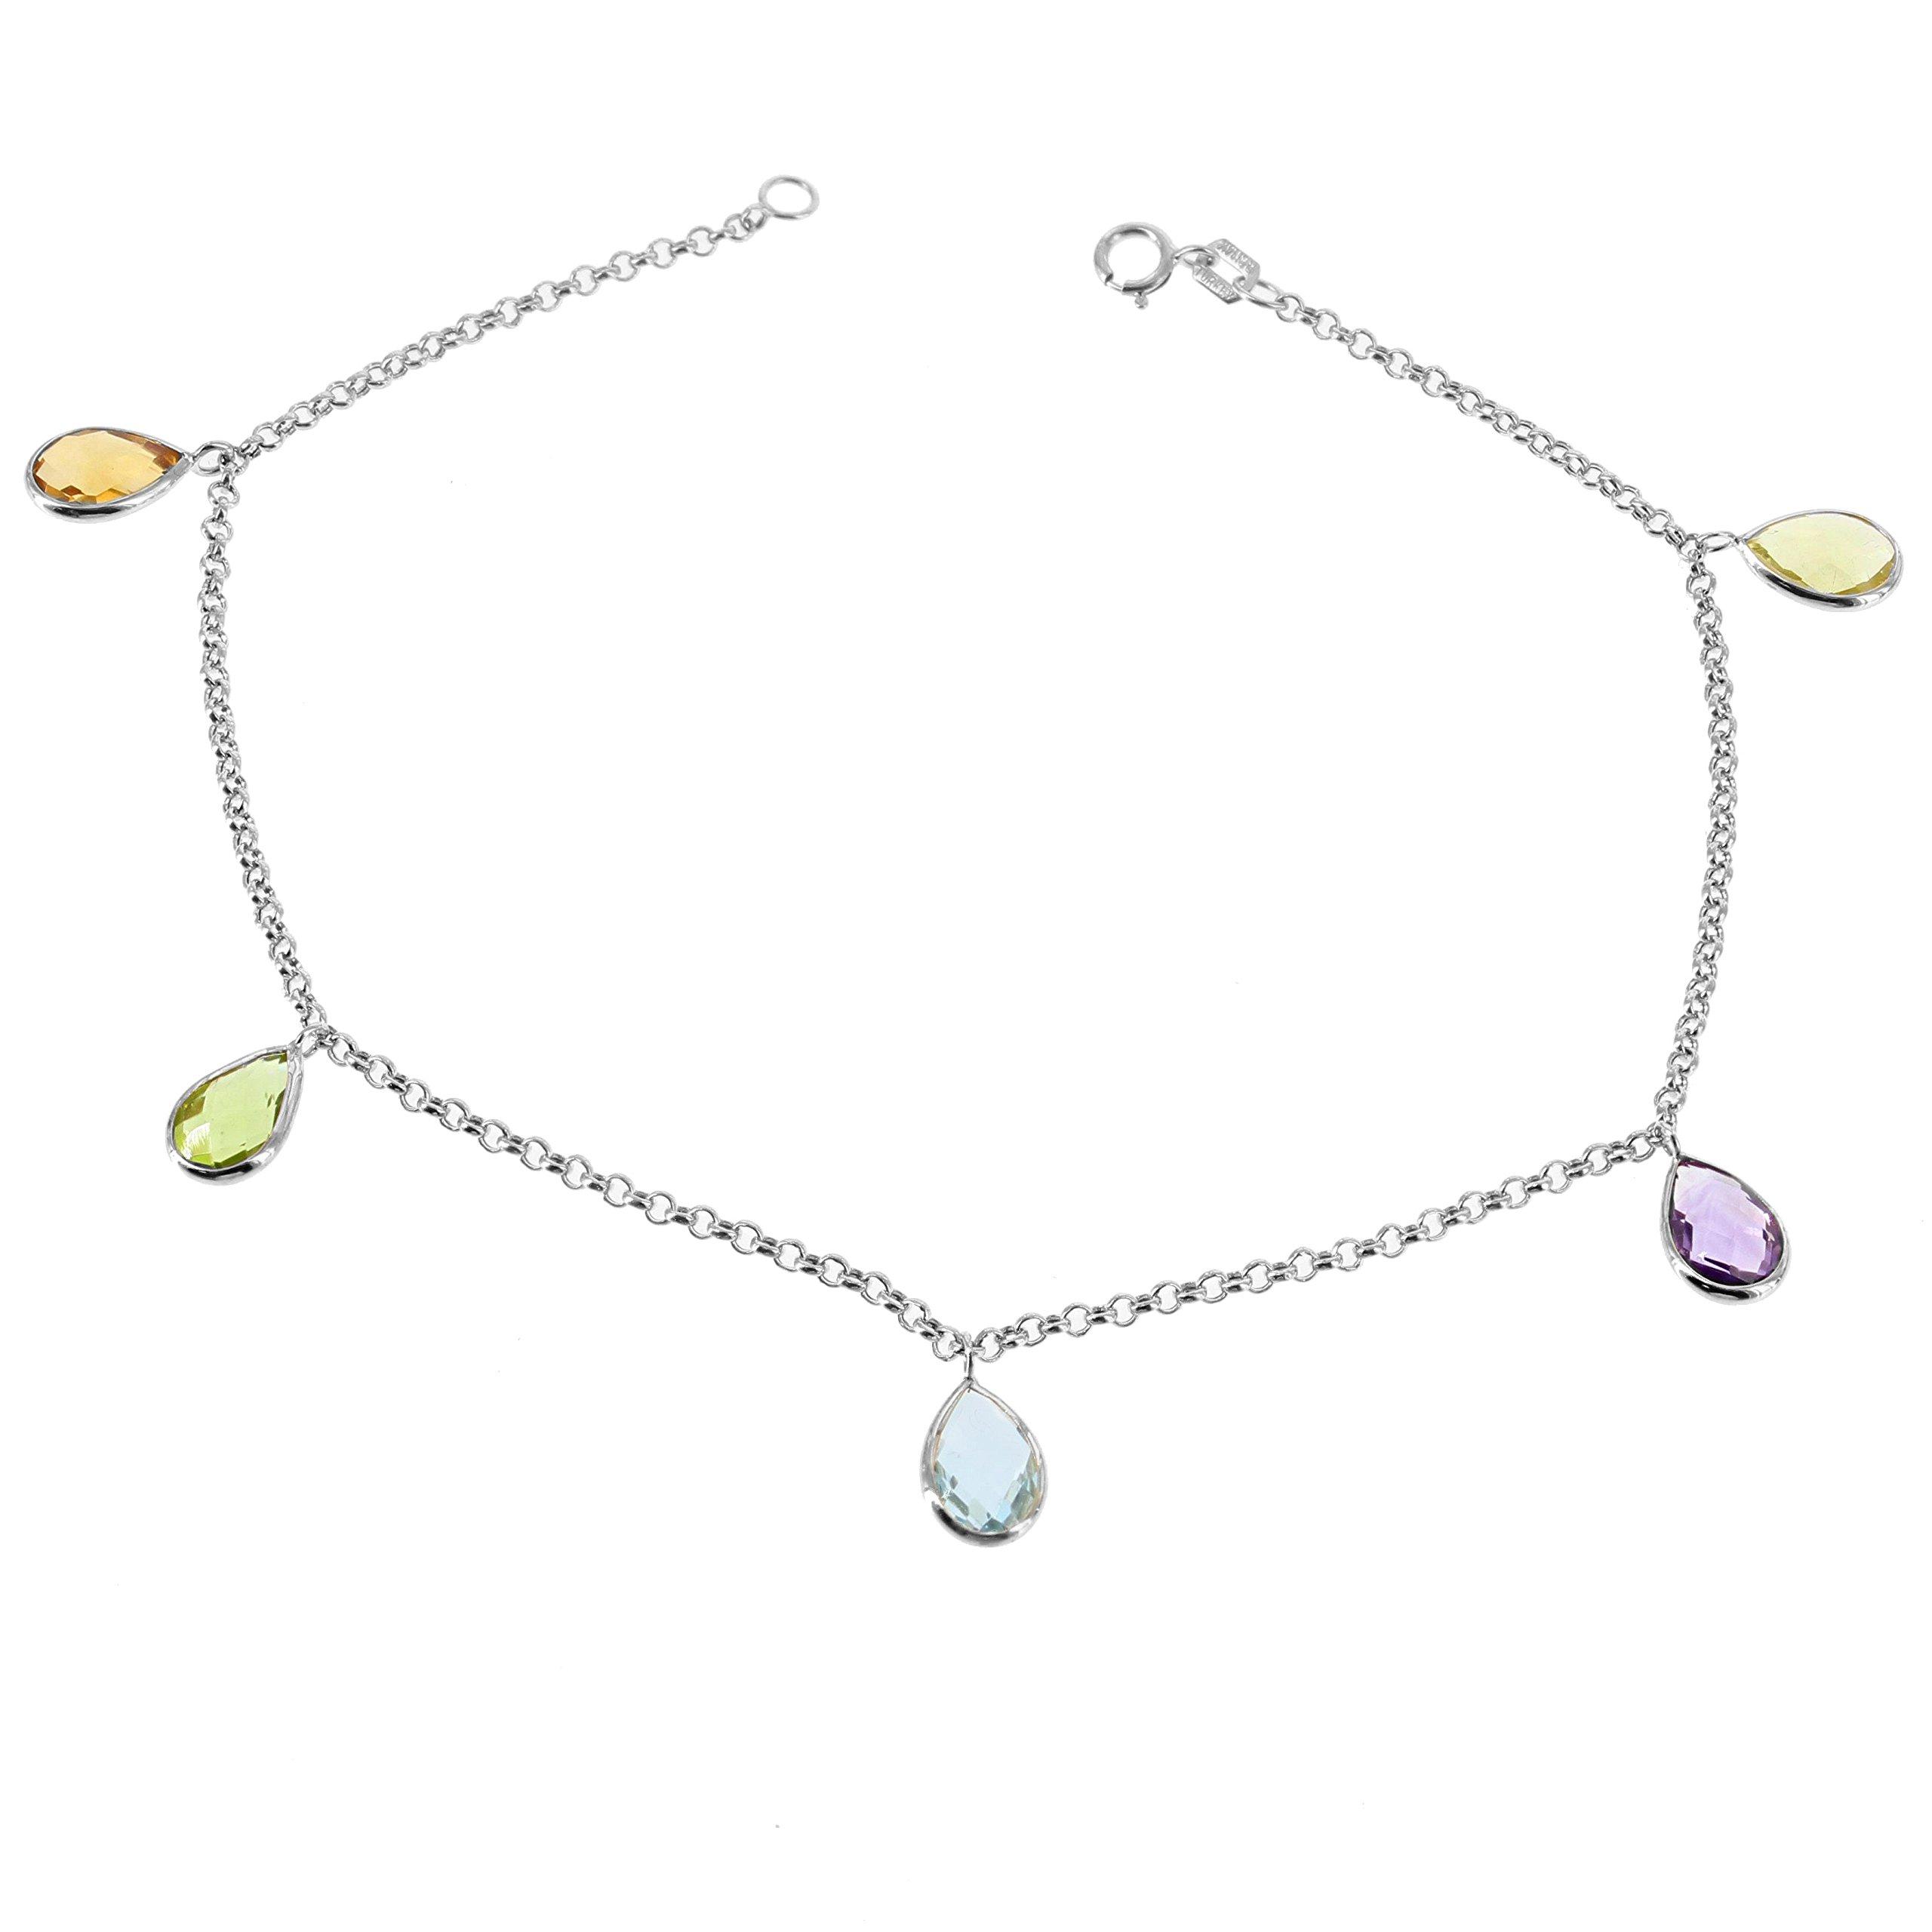 14K White Gold Gemstone Anklet Bracelet With Hanging Gemstones 9 -11 Inches